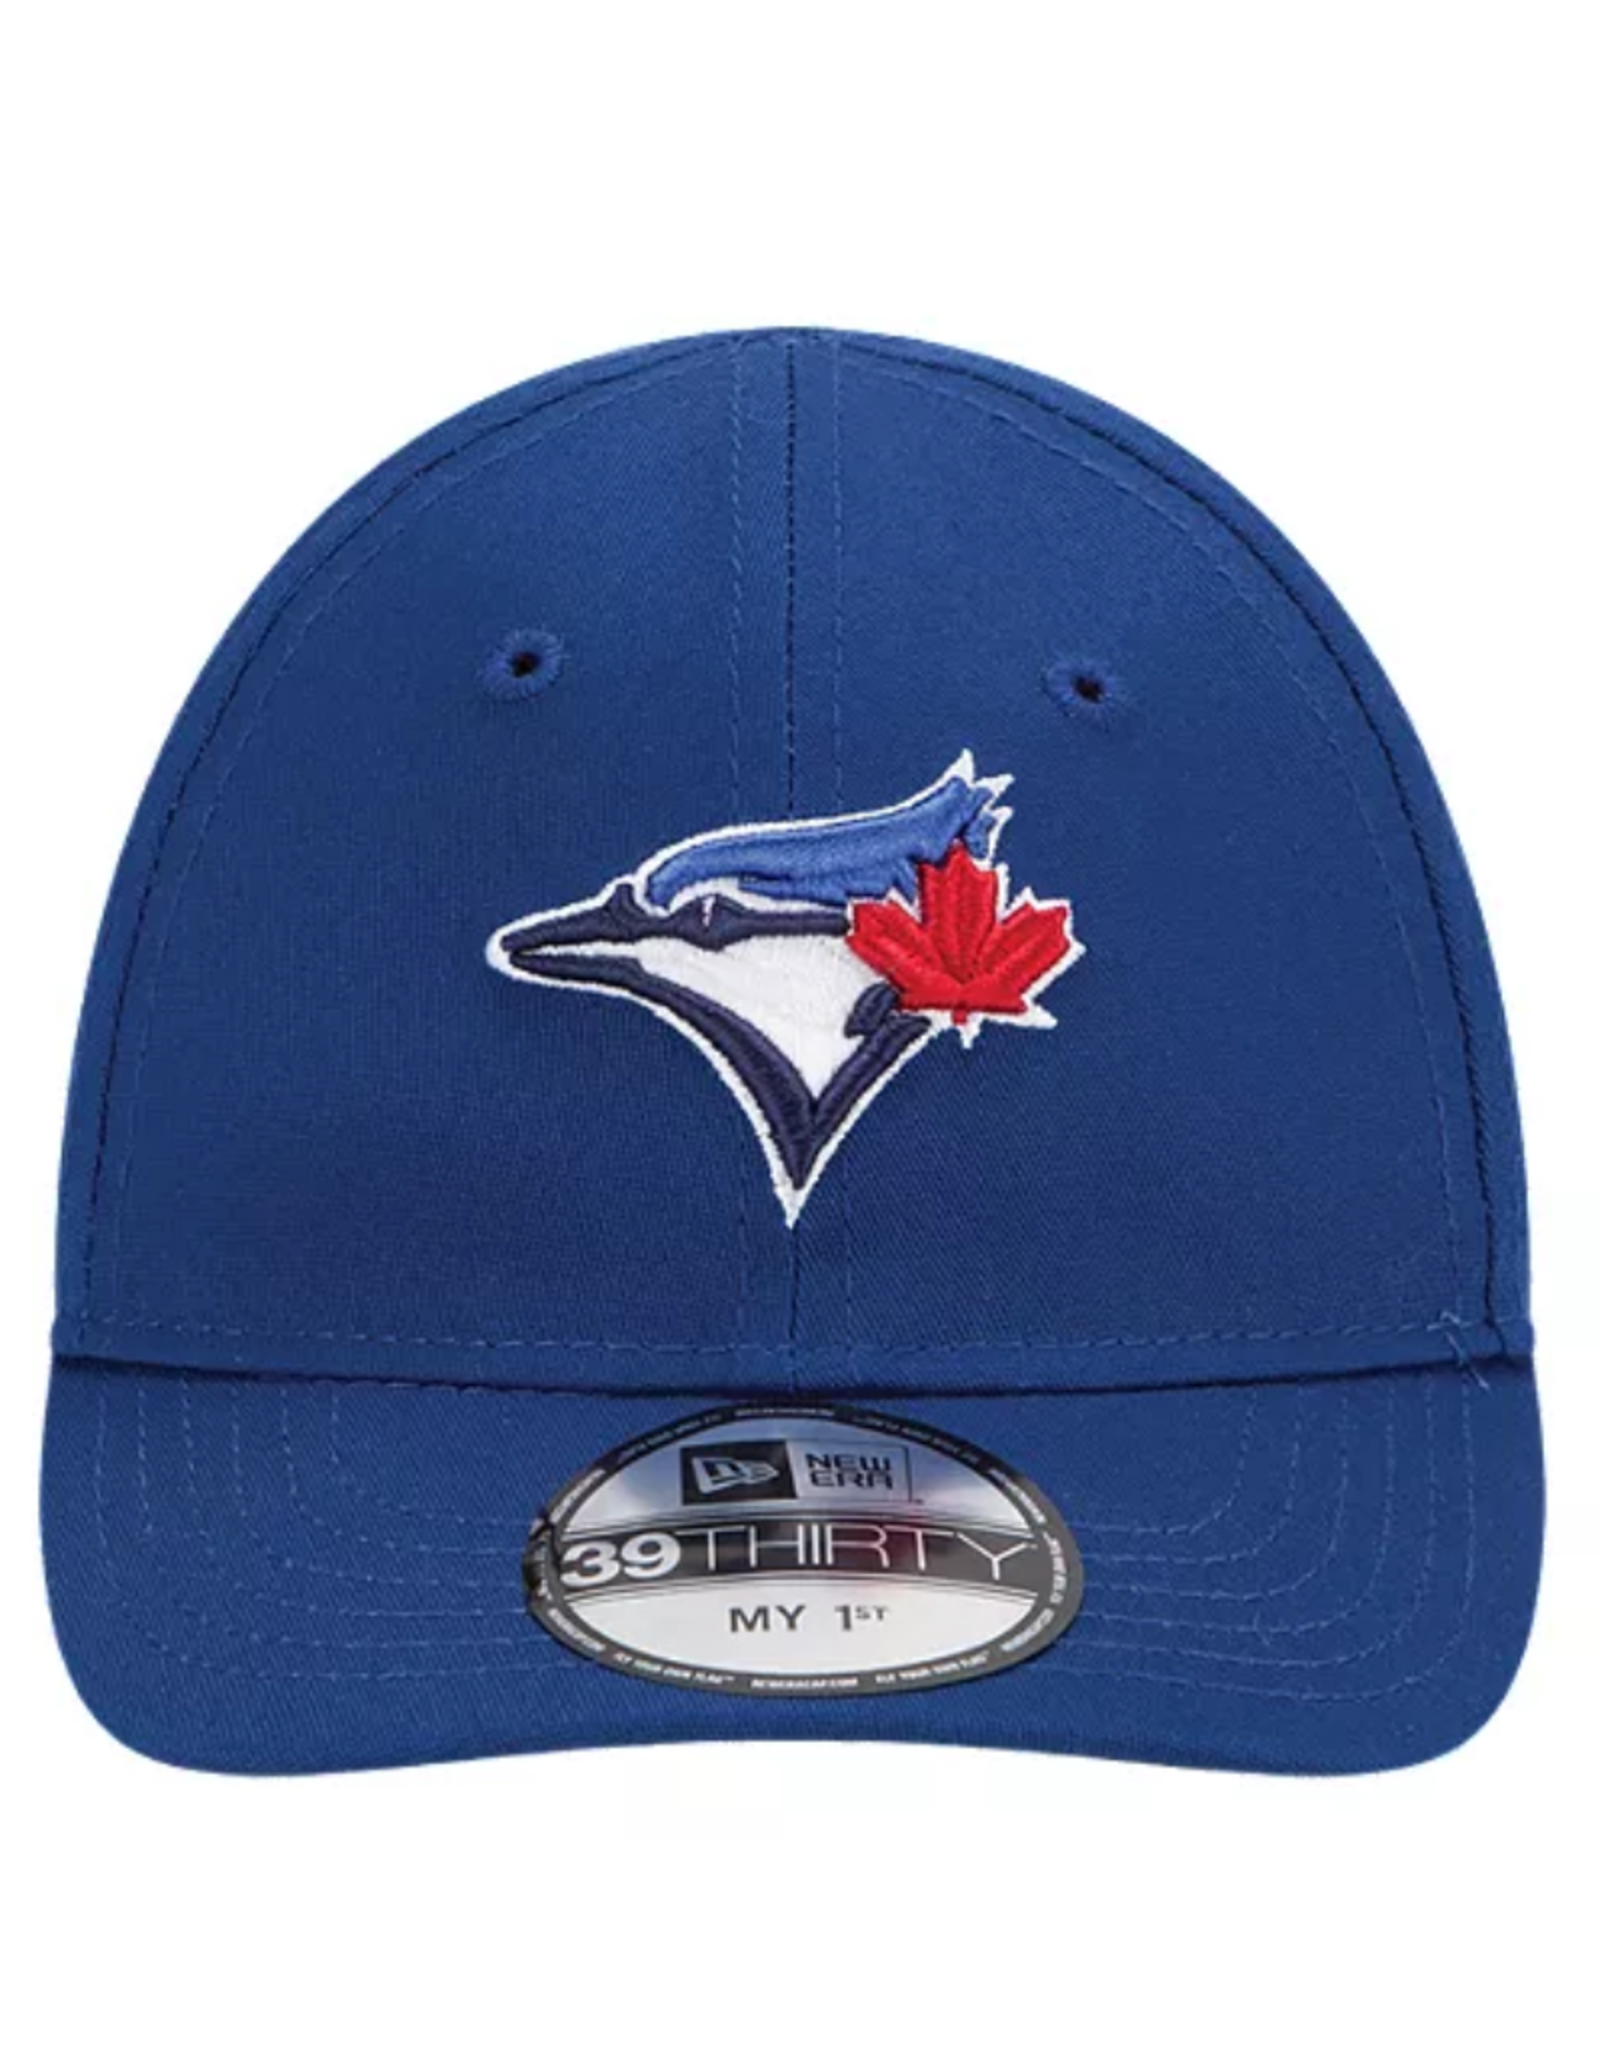 New Era Infant My 1st 39THIRTY Hat Toronto Blue Jays